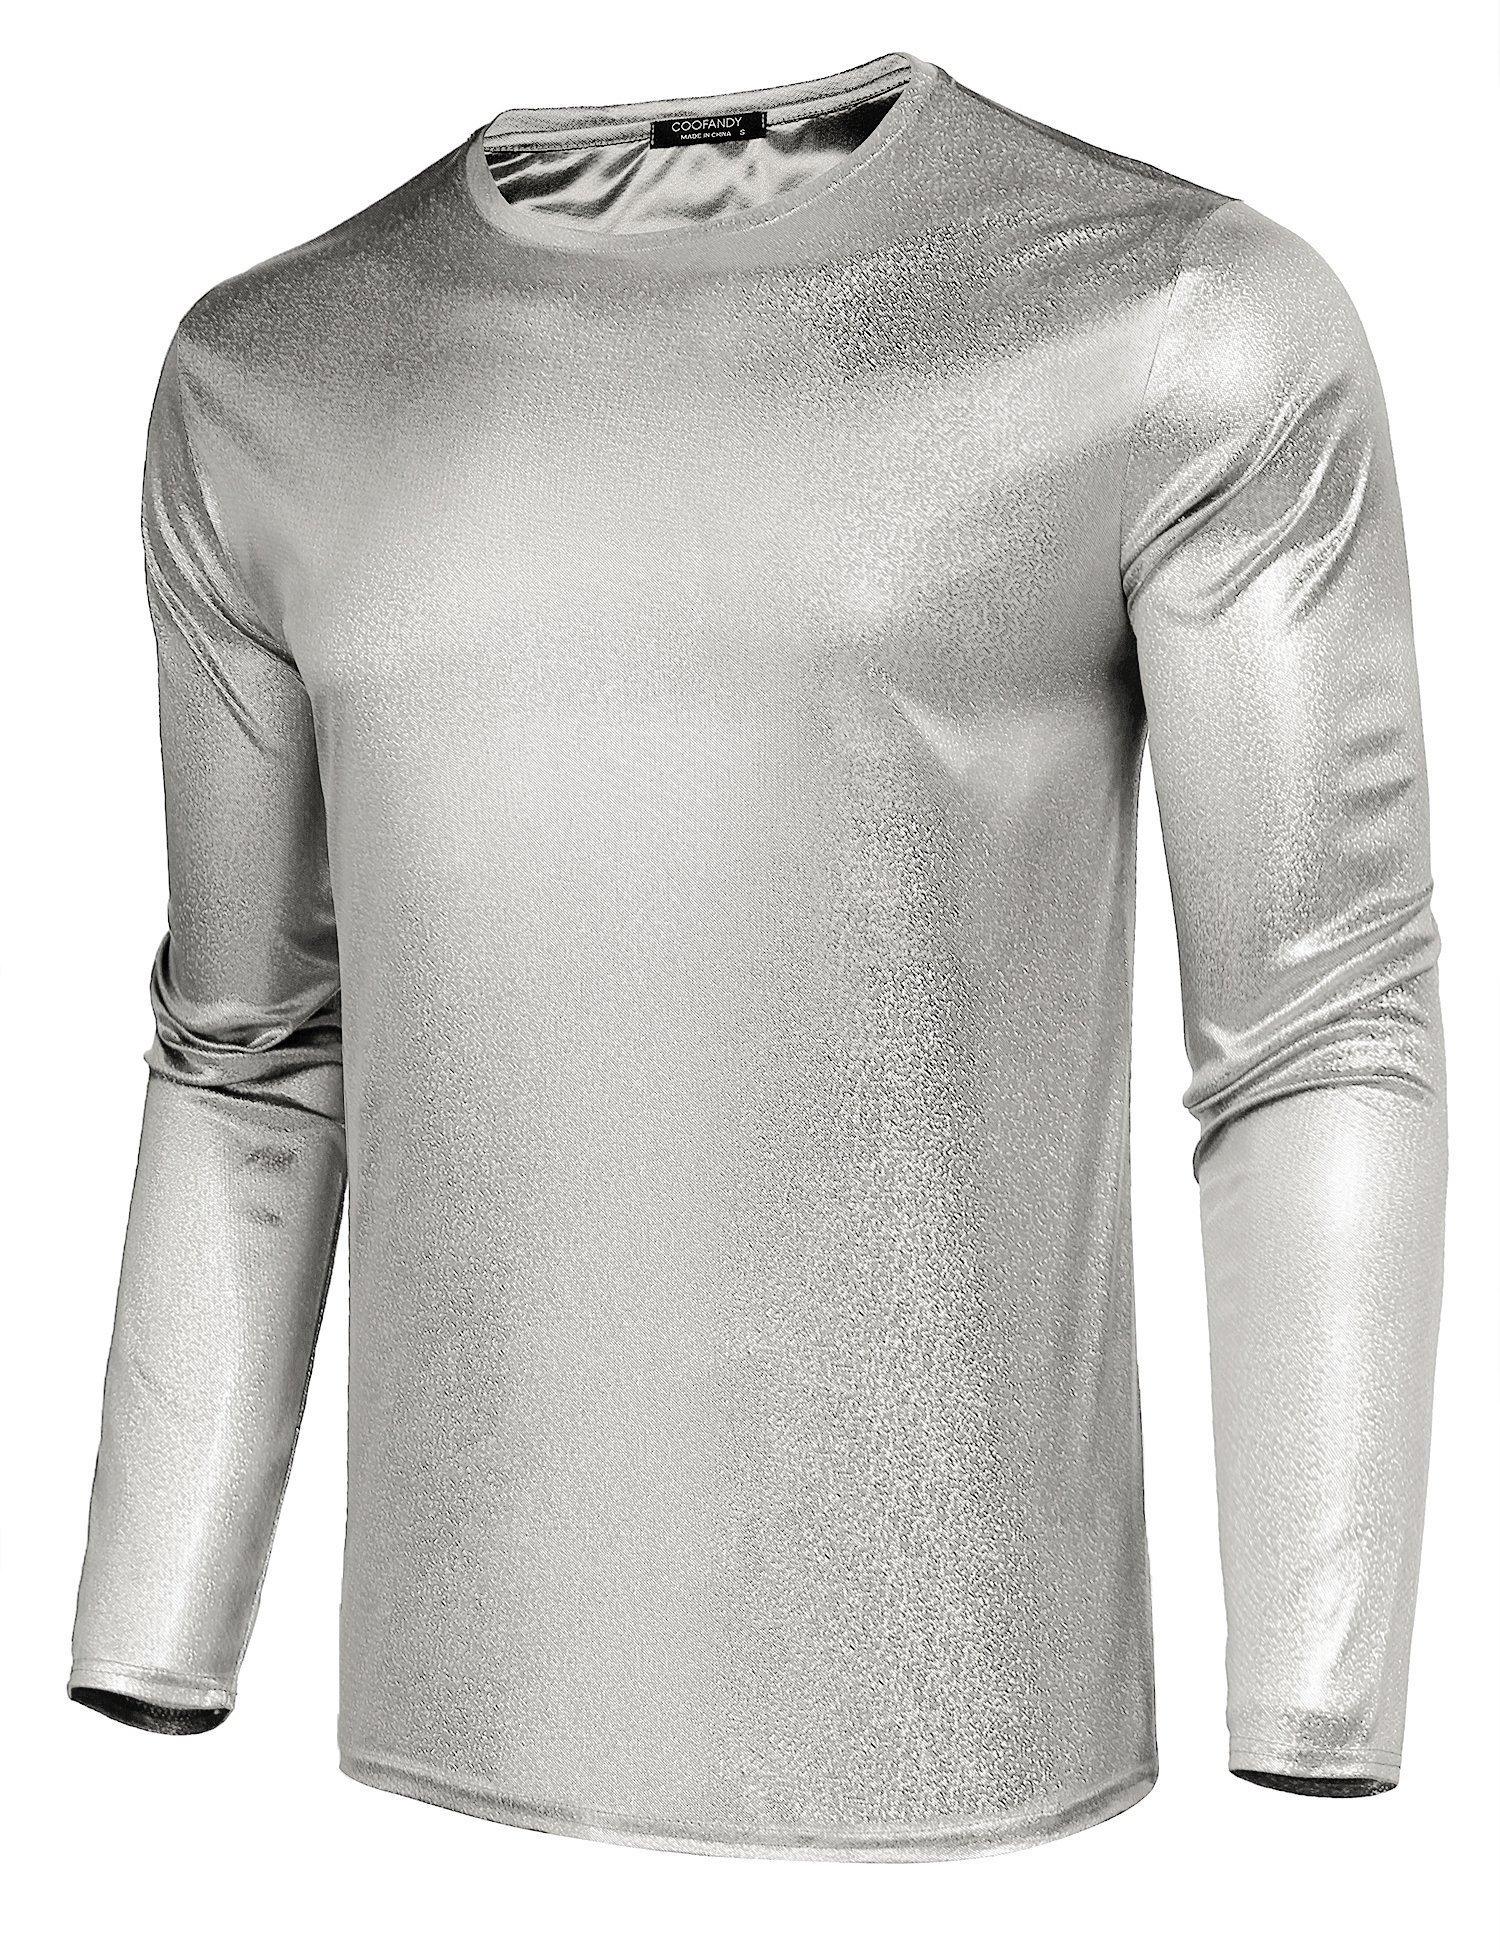 COOFANDY Mens Metallic Nightclub Disco Style Shiny Long Sleeve Top Shirts